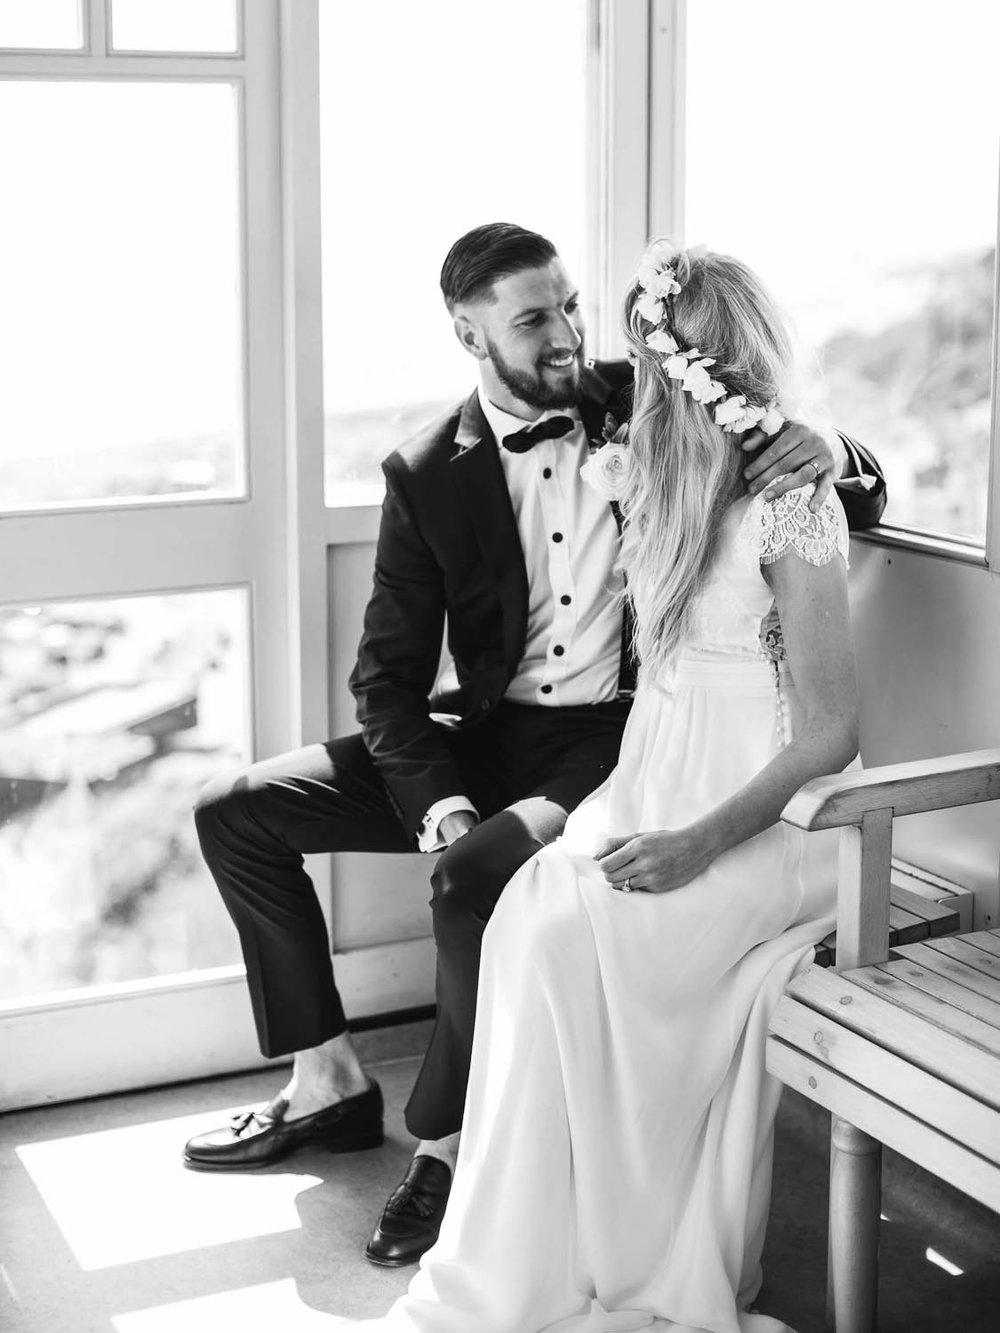 Amy O'Boyle Photography, Destination & UK Fine Art Film Wedding Photographer, Hastings Wedding-20.jpg